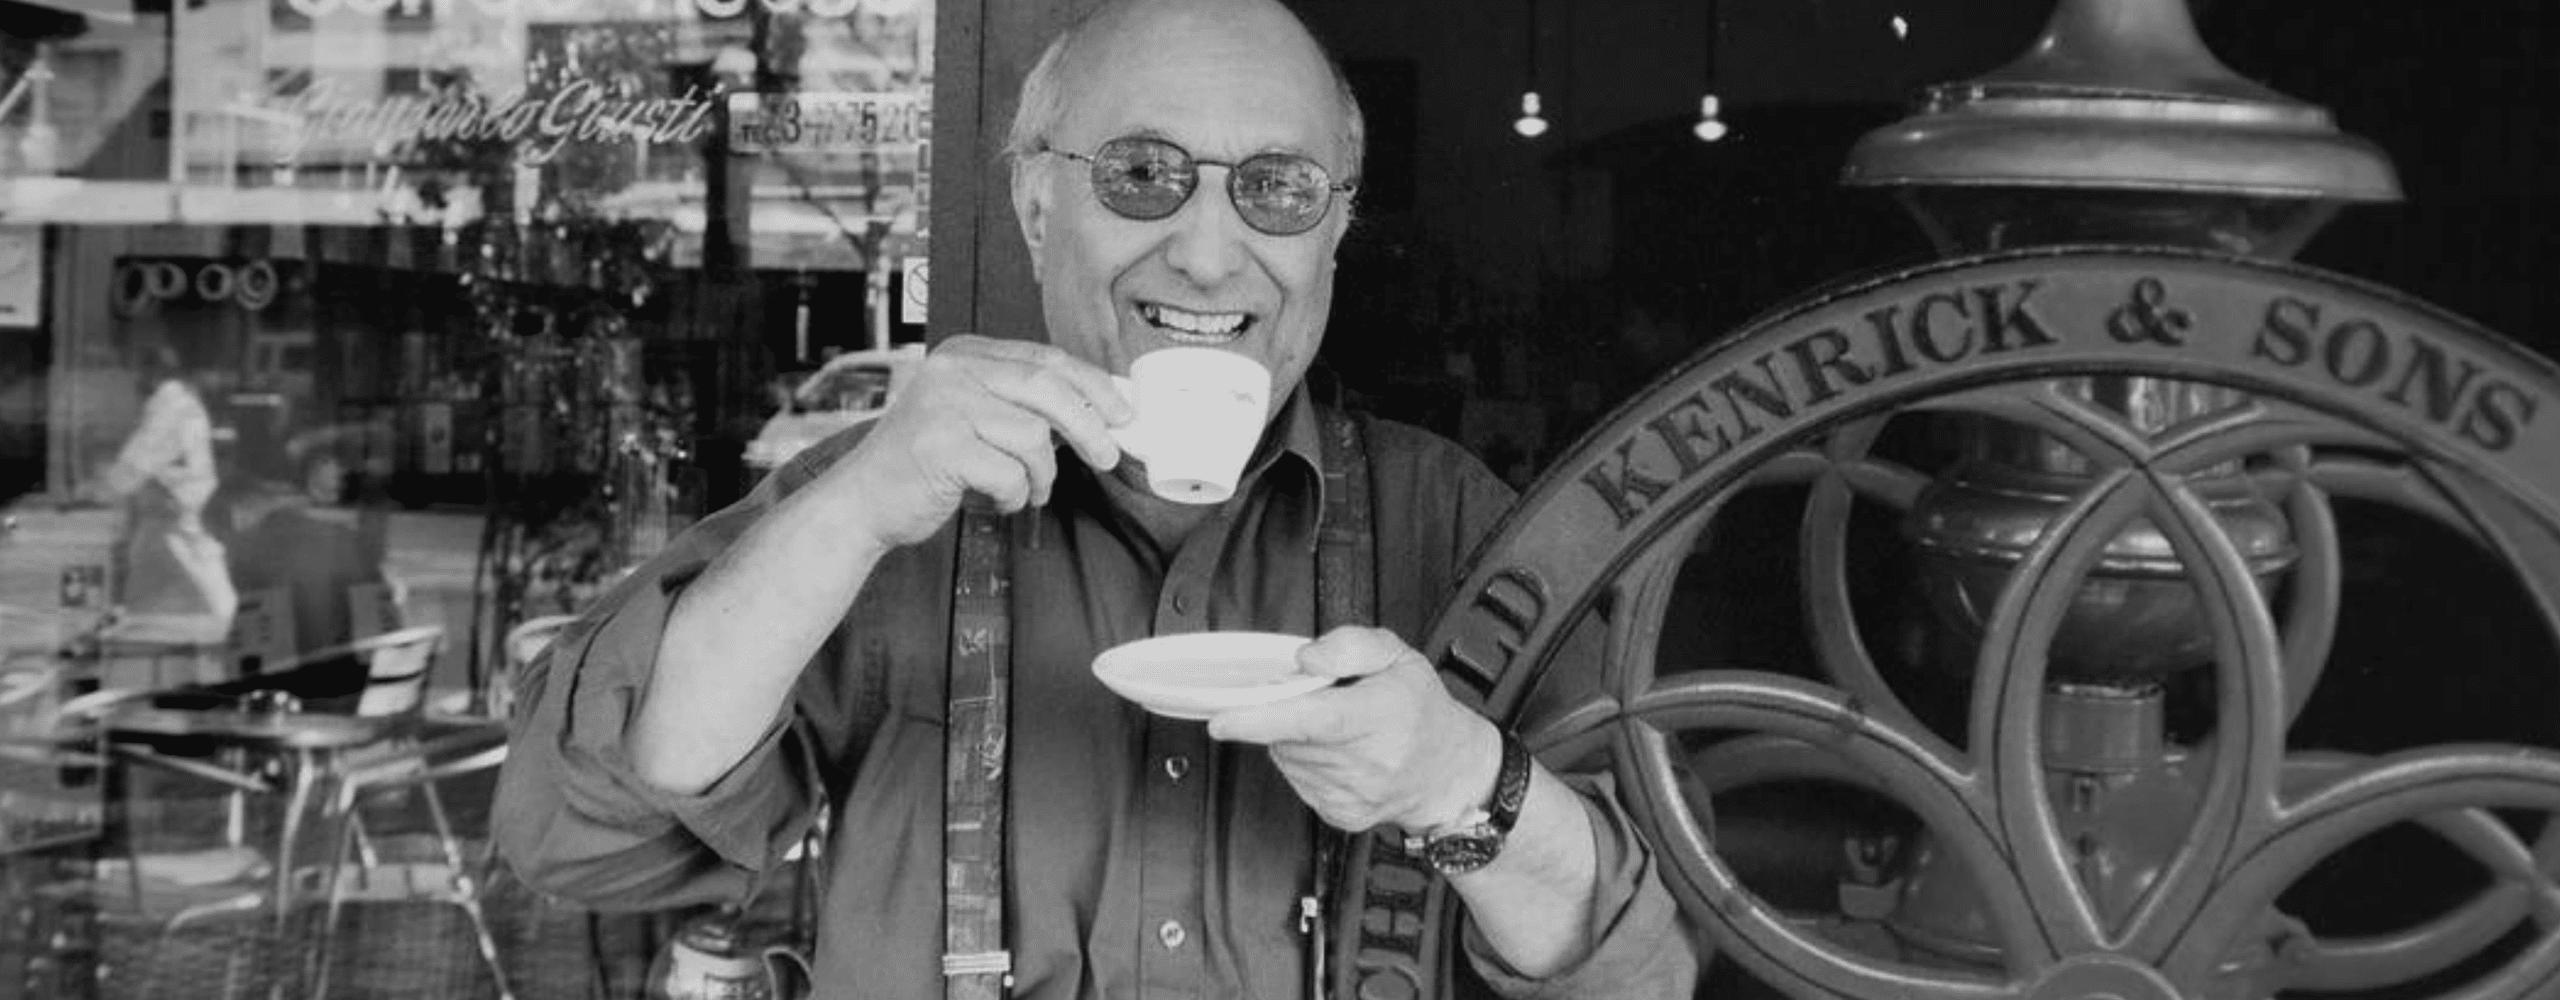 Giancarlo Giusti 2